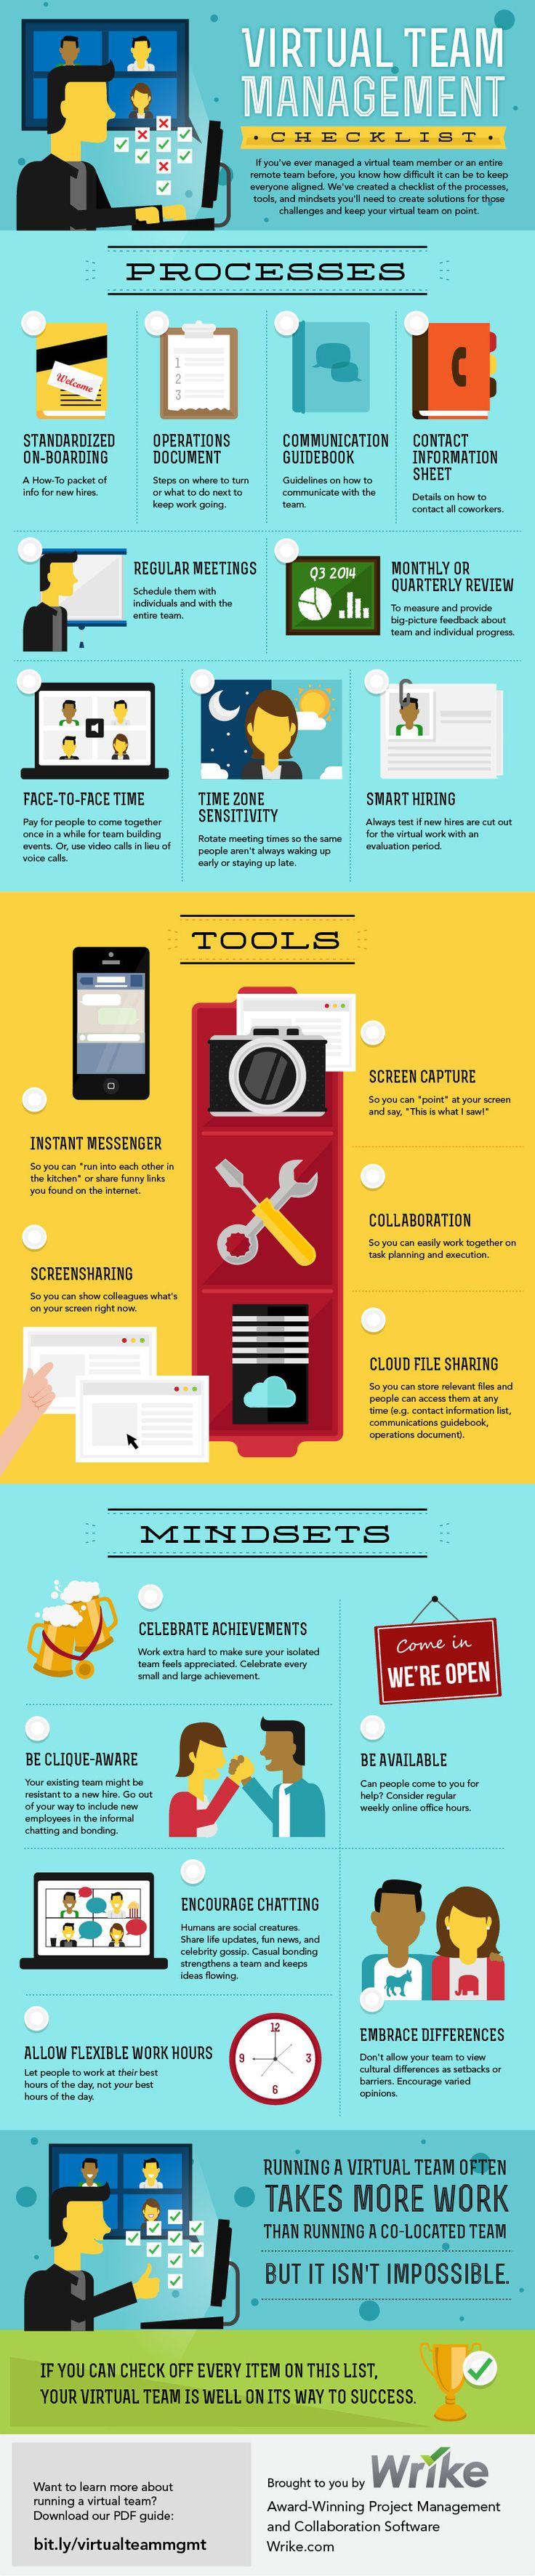 Virtual Team Management Checklist #infographic #VirtualManagement #Business